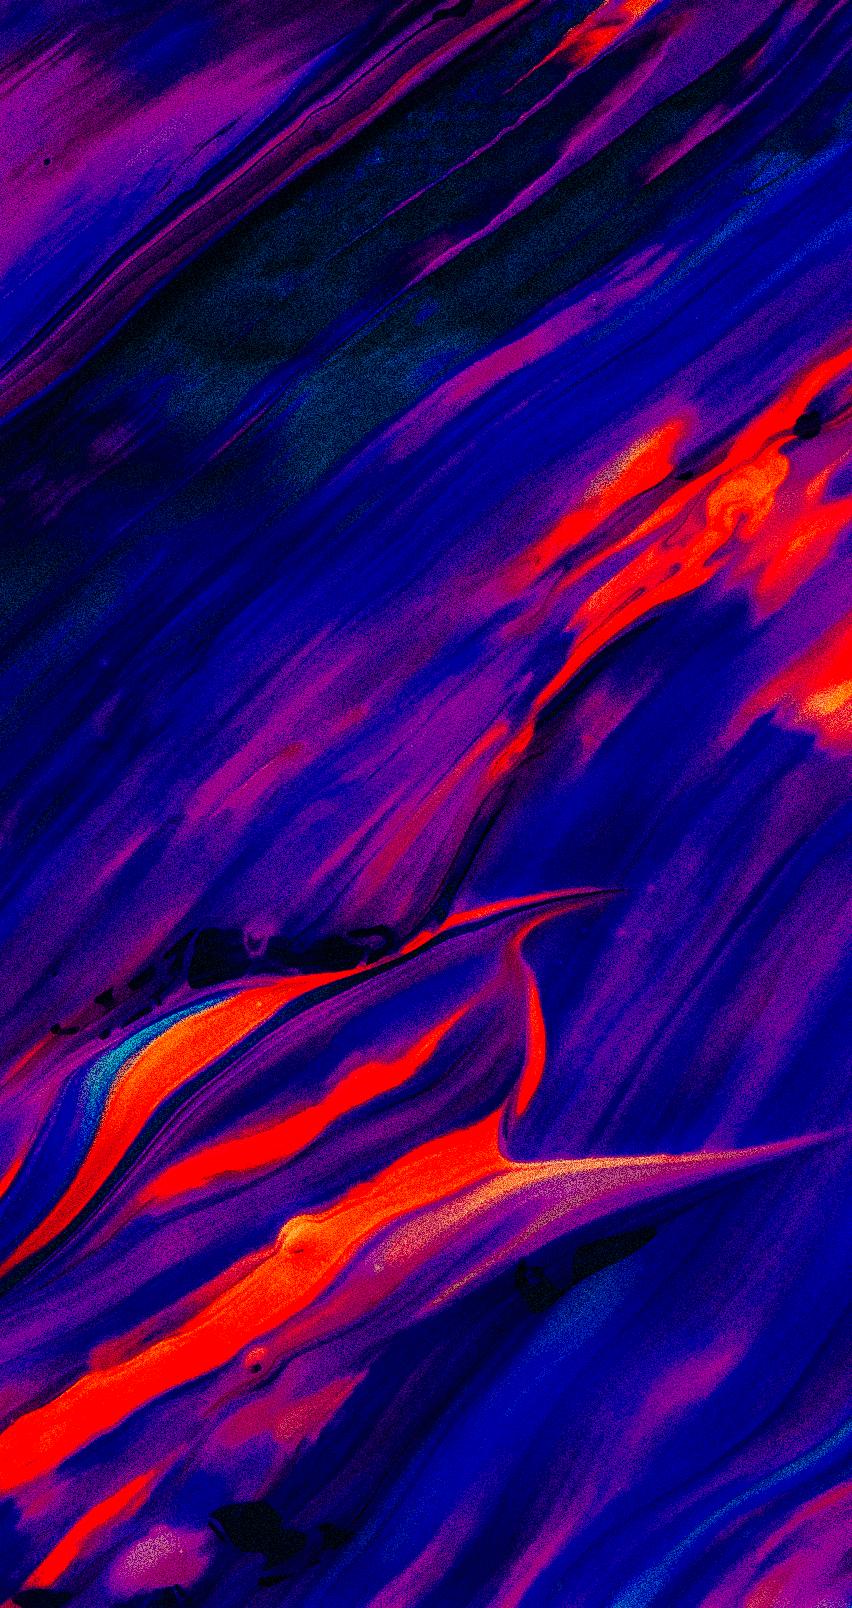 Liquid Iphone X Wallpapers Top Free Liquid Iphone X